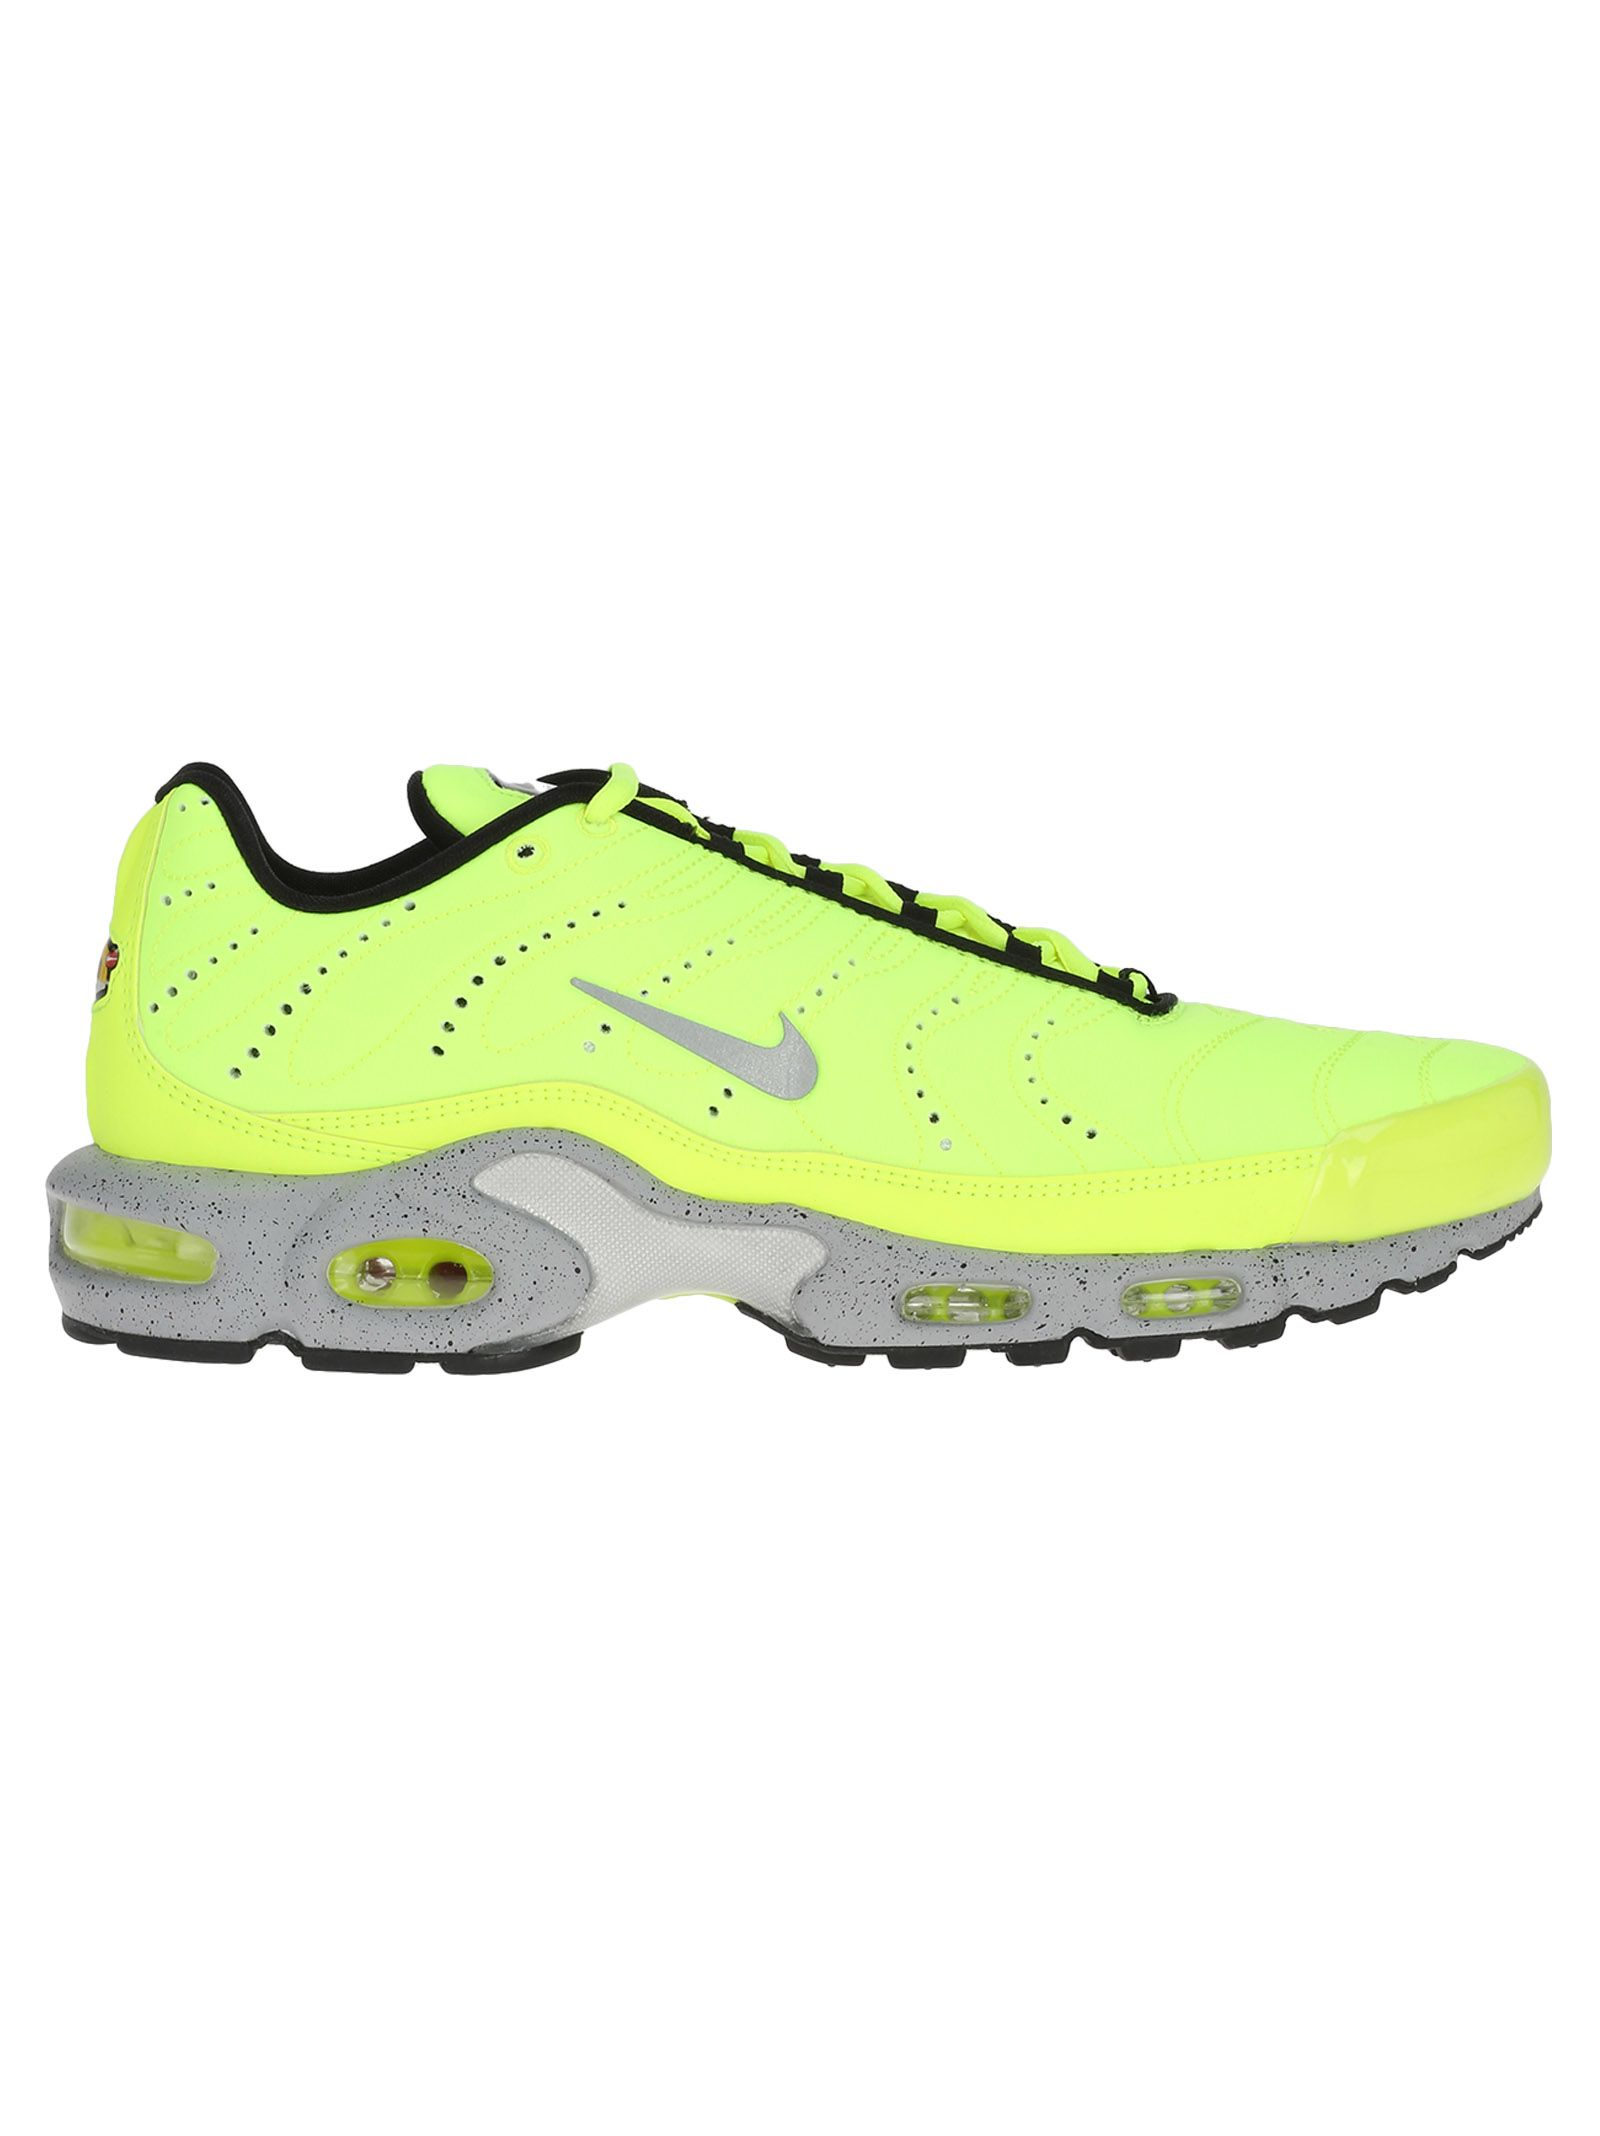 quality design fdd3b fad31 Nike Ltd Air Max Plus Prm - Basic ...